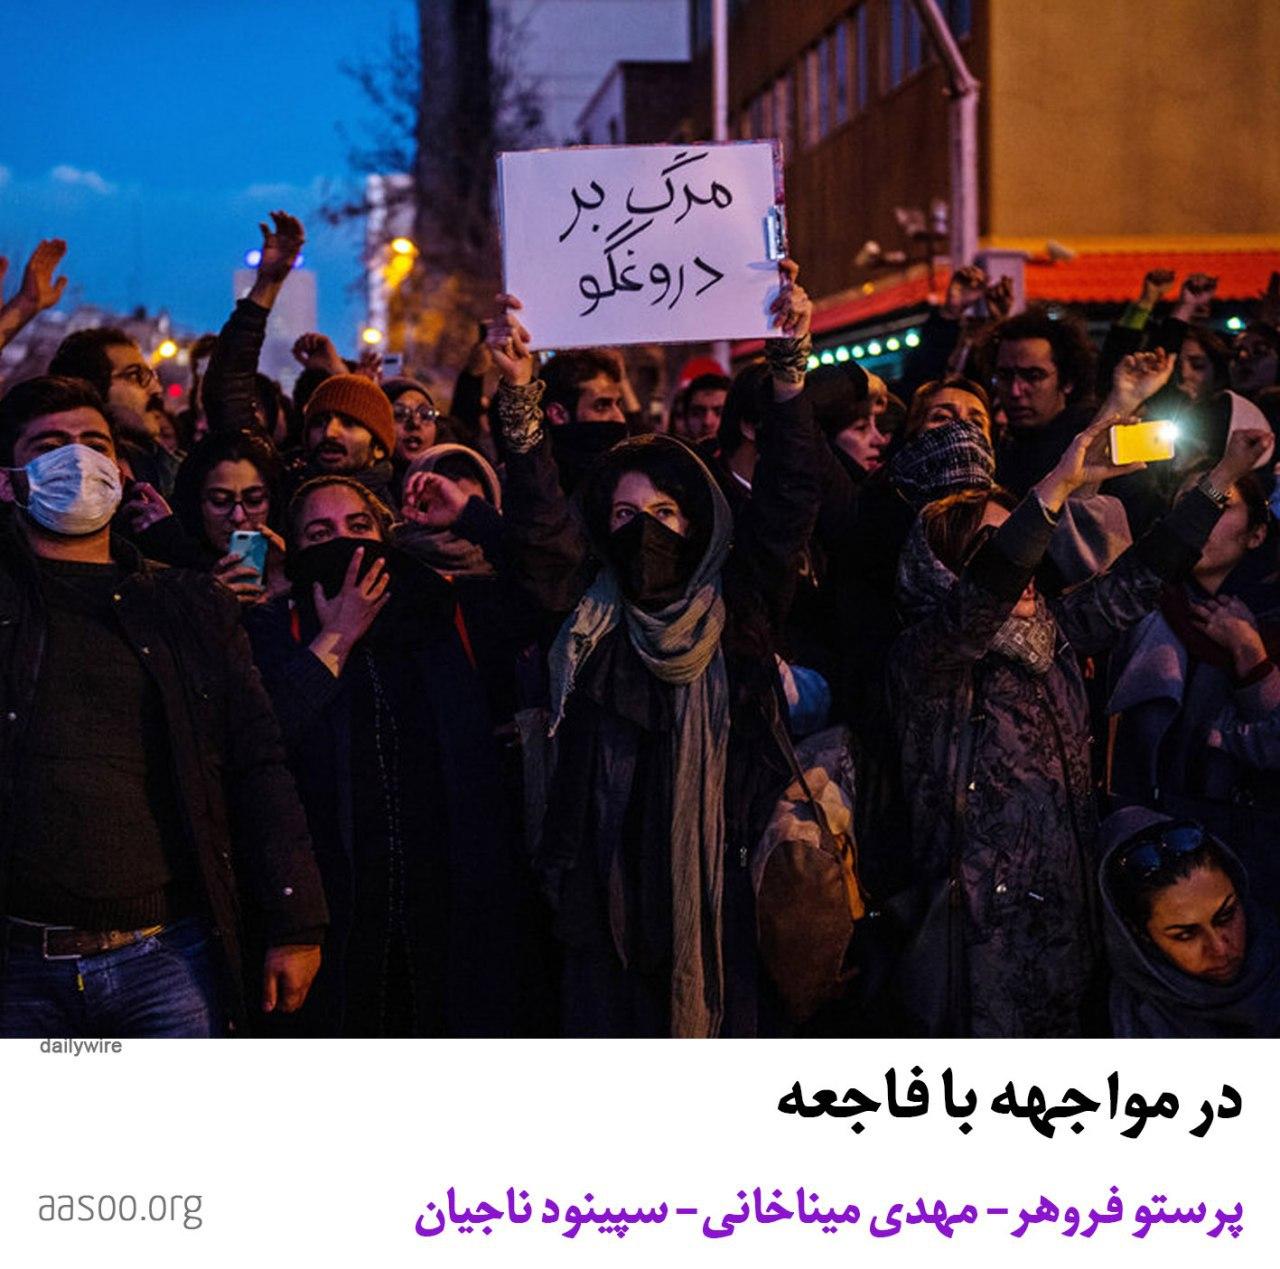 «سرکوب خشونتبار اعتراضات مردم … 336313001584096605